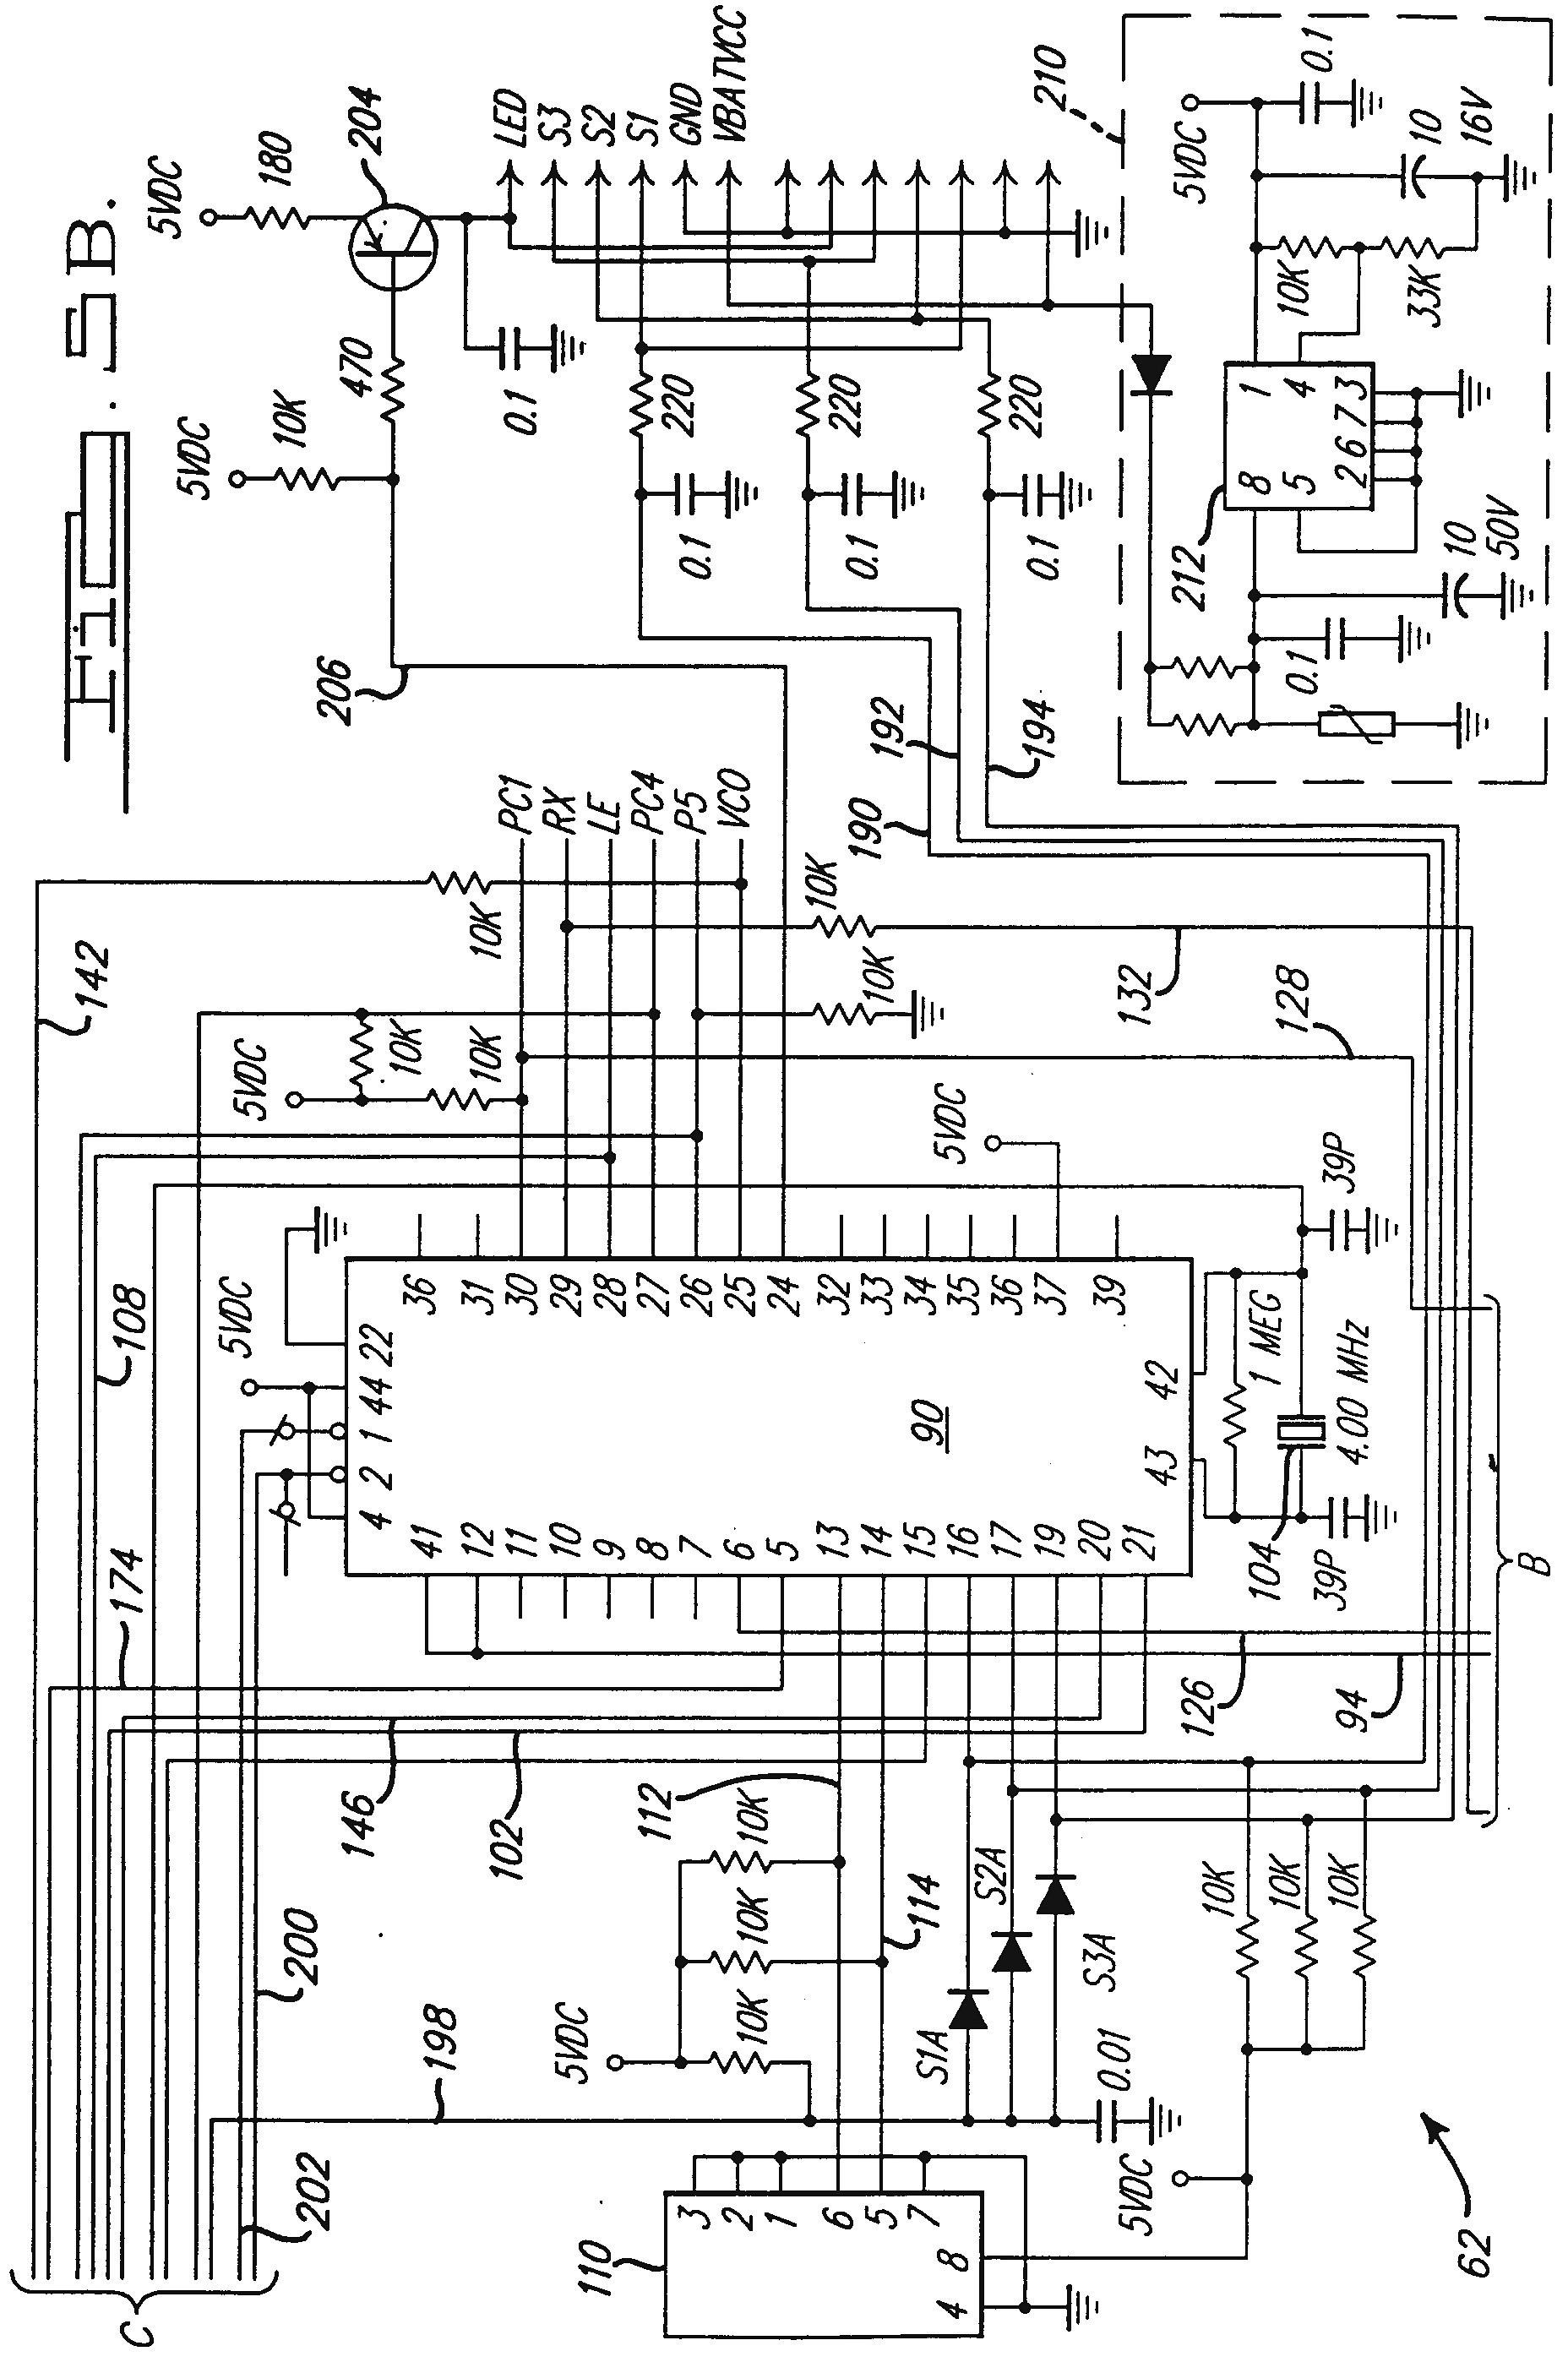 circuit board wiring diagram also circuit board schematic diagram